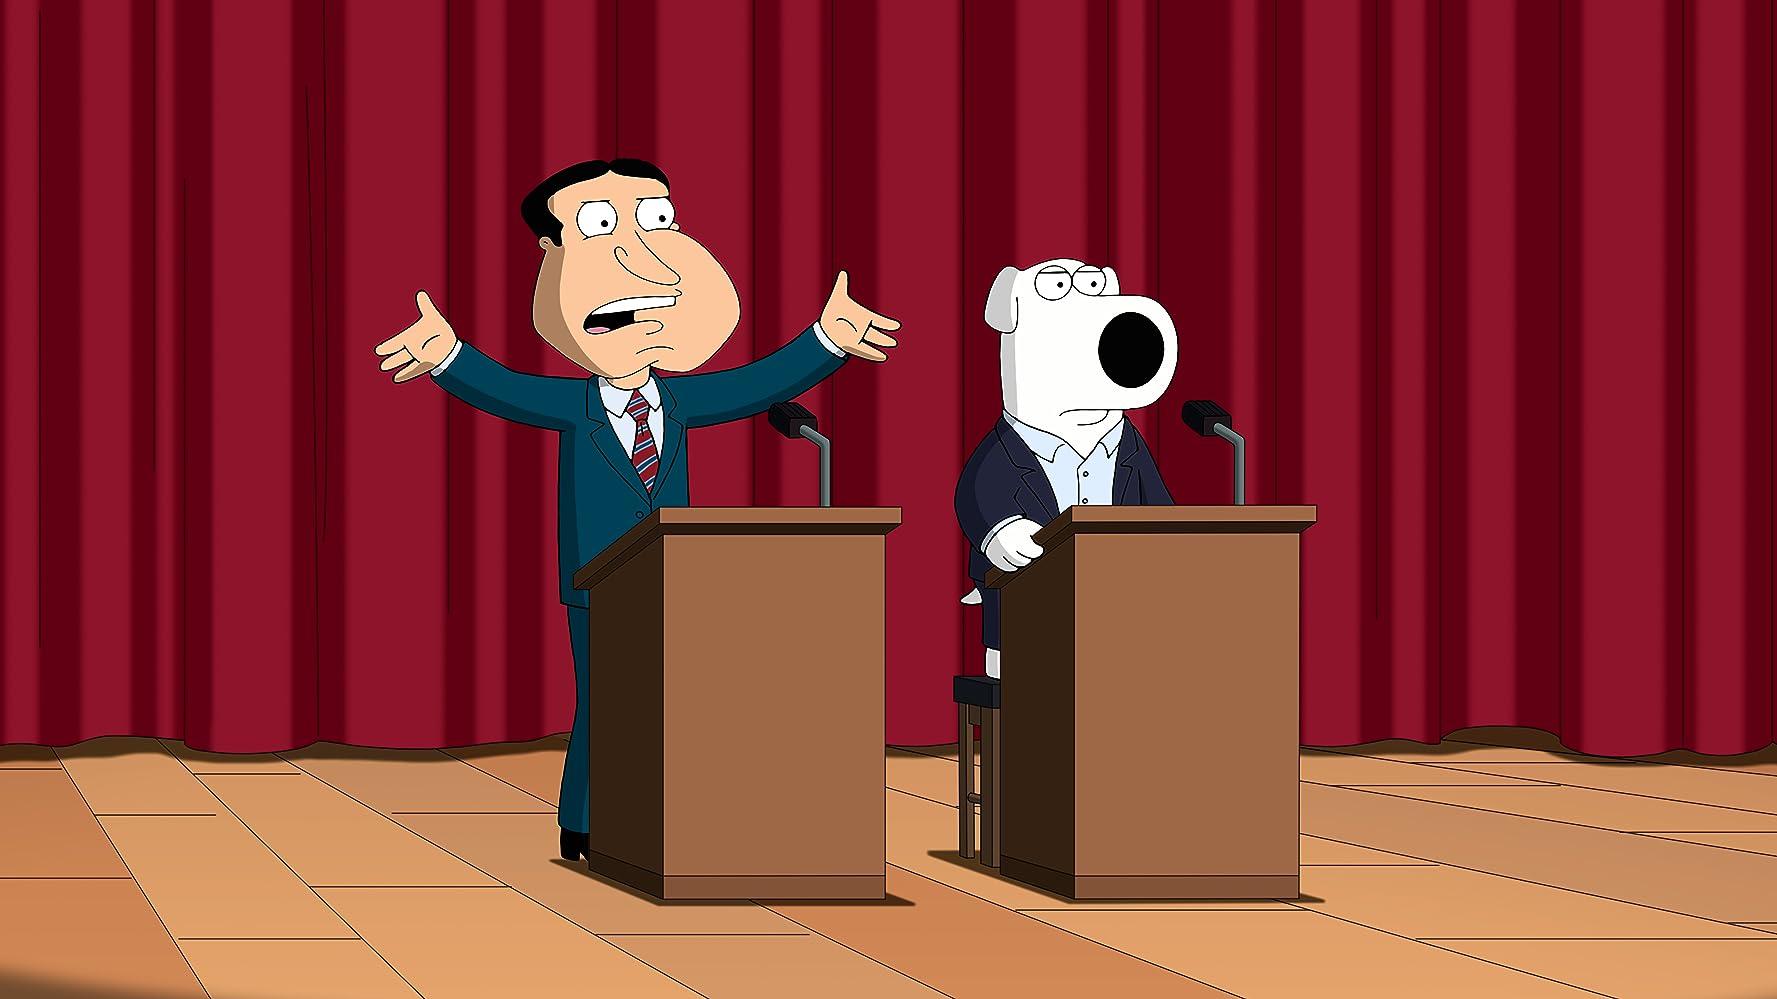 Seth MacFarlane in Family Guy (1999)